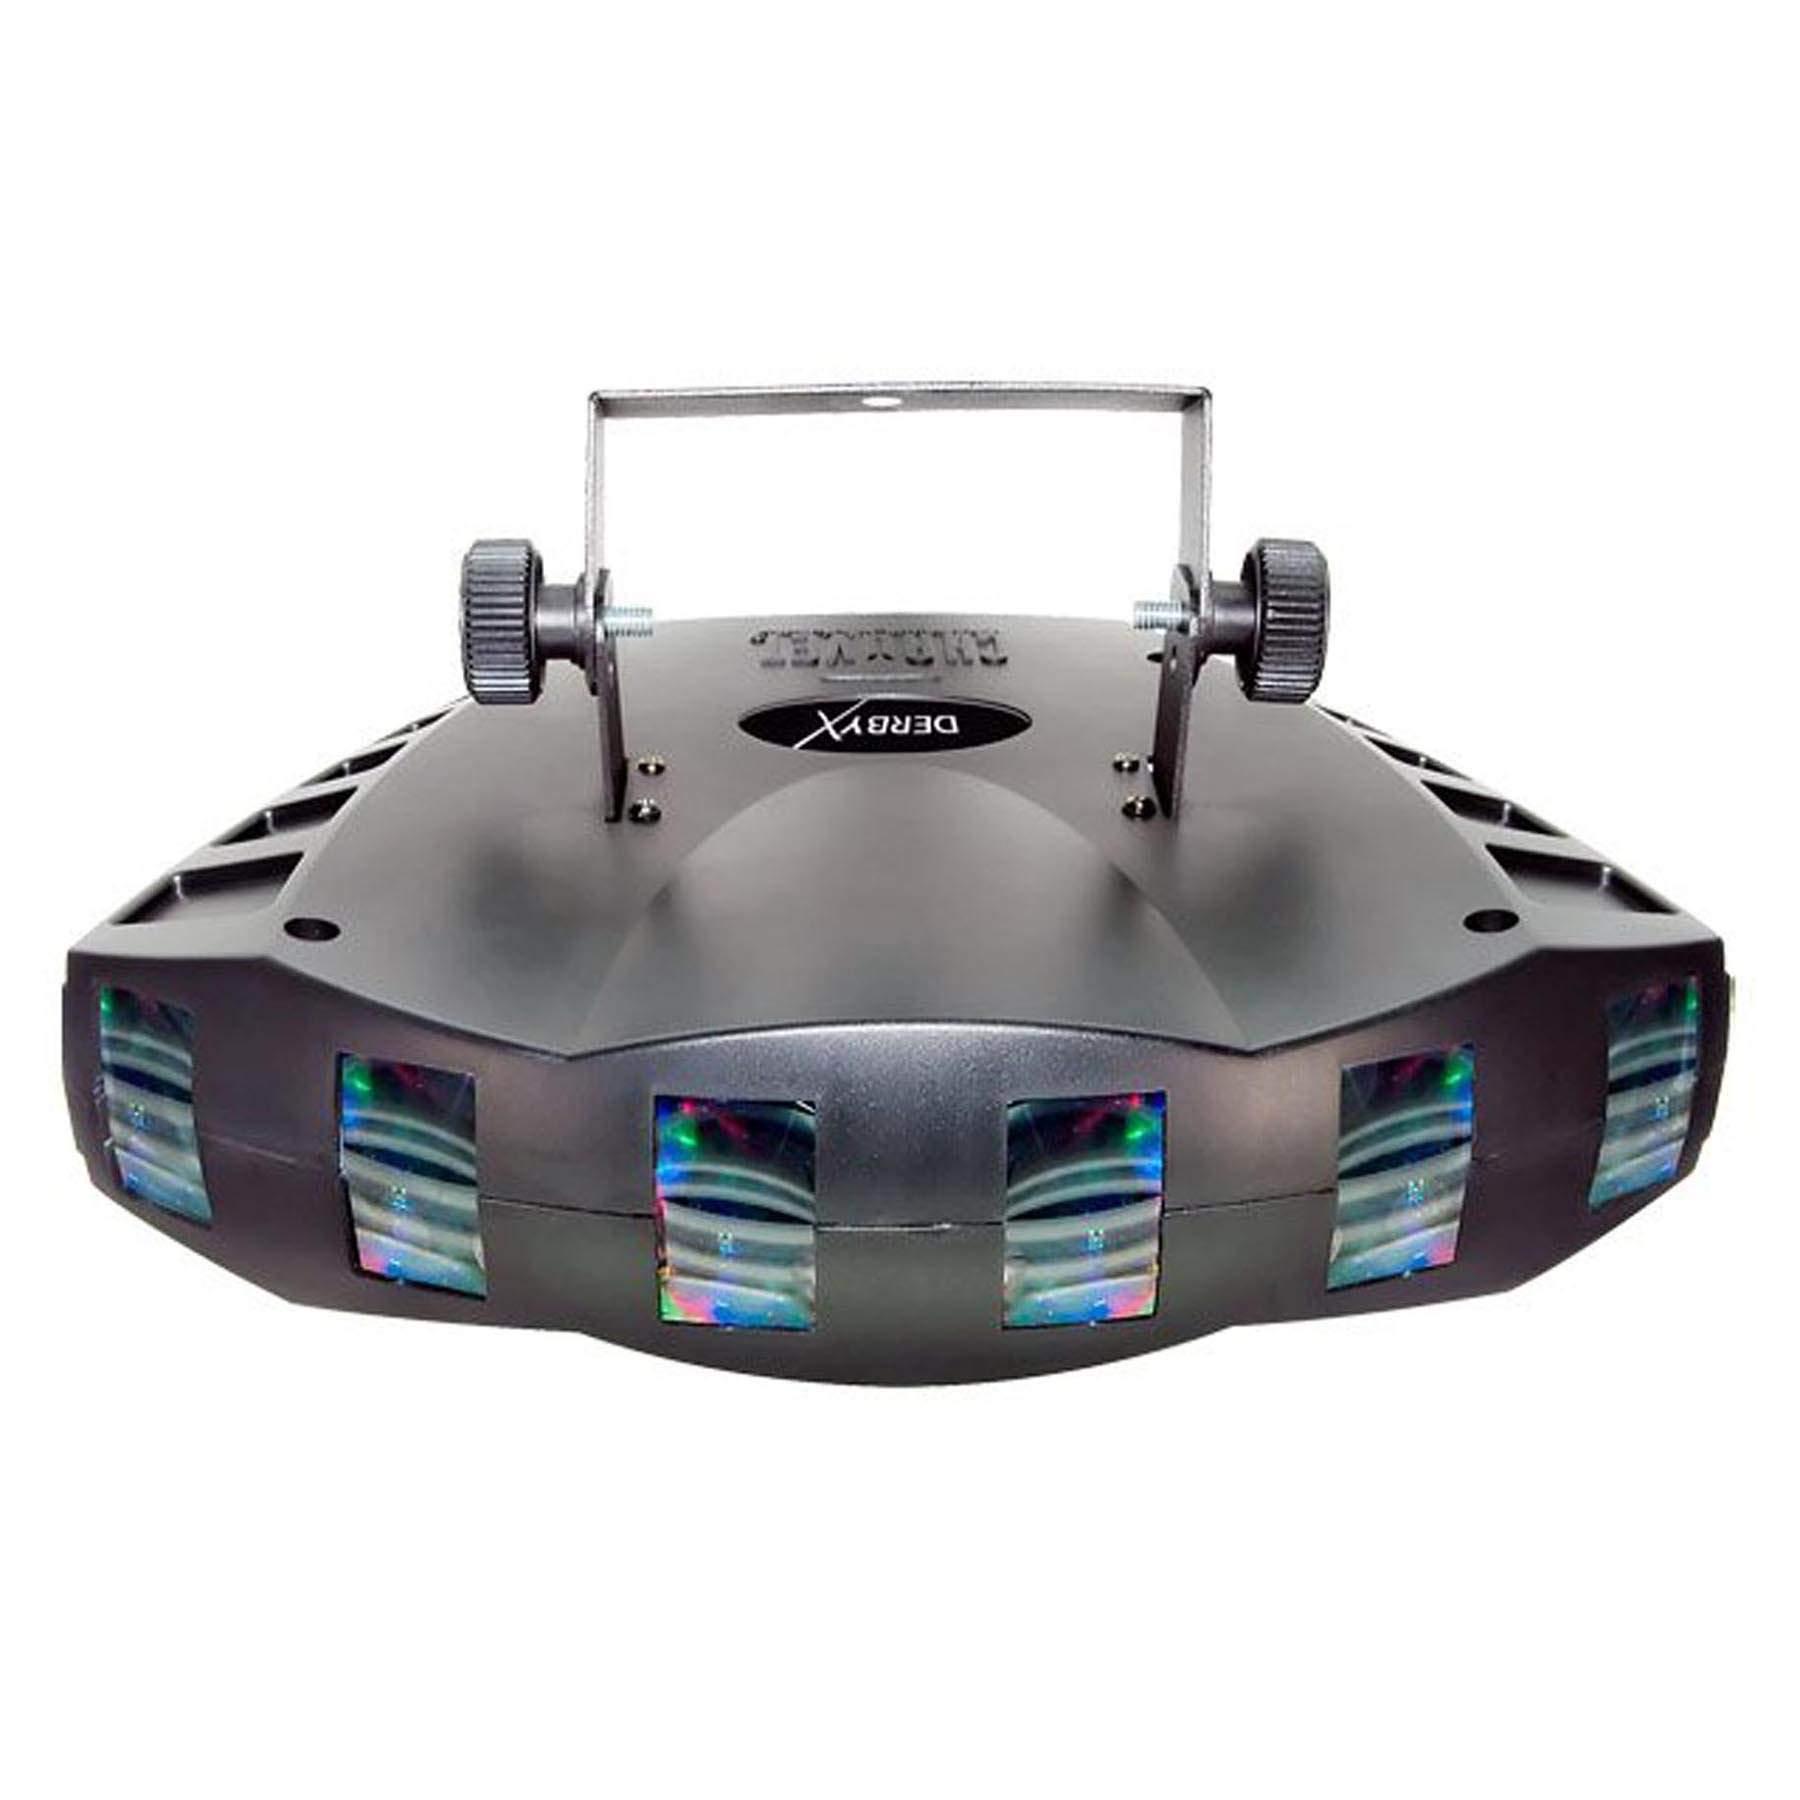 Chauvet DJ Derby X DMX-512 Multi-Colored LED RGB Strobe DJ Lighting Effect by CHAUVET DJ